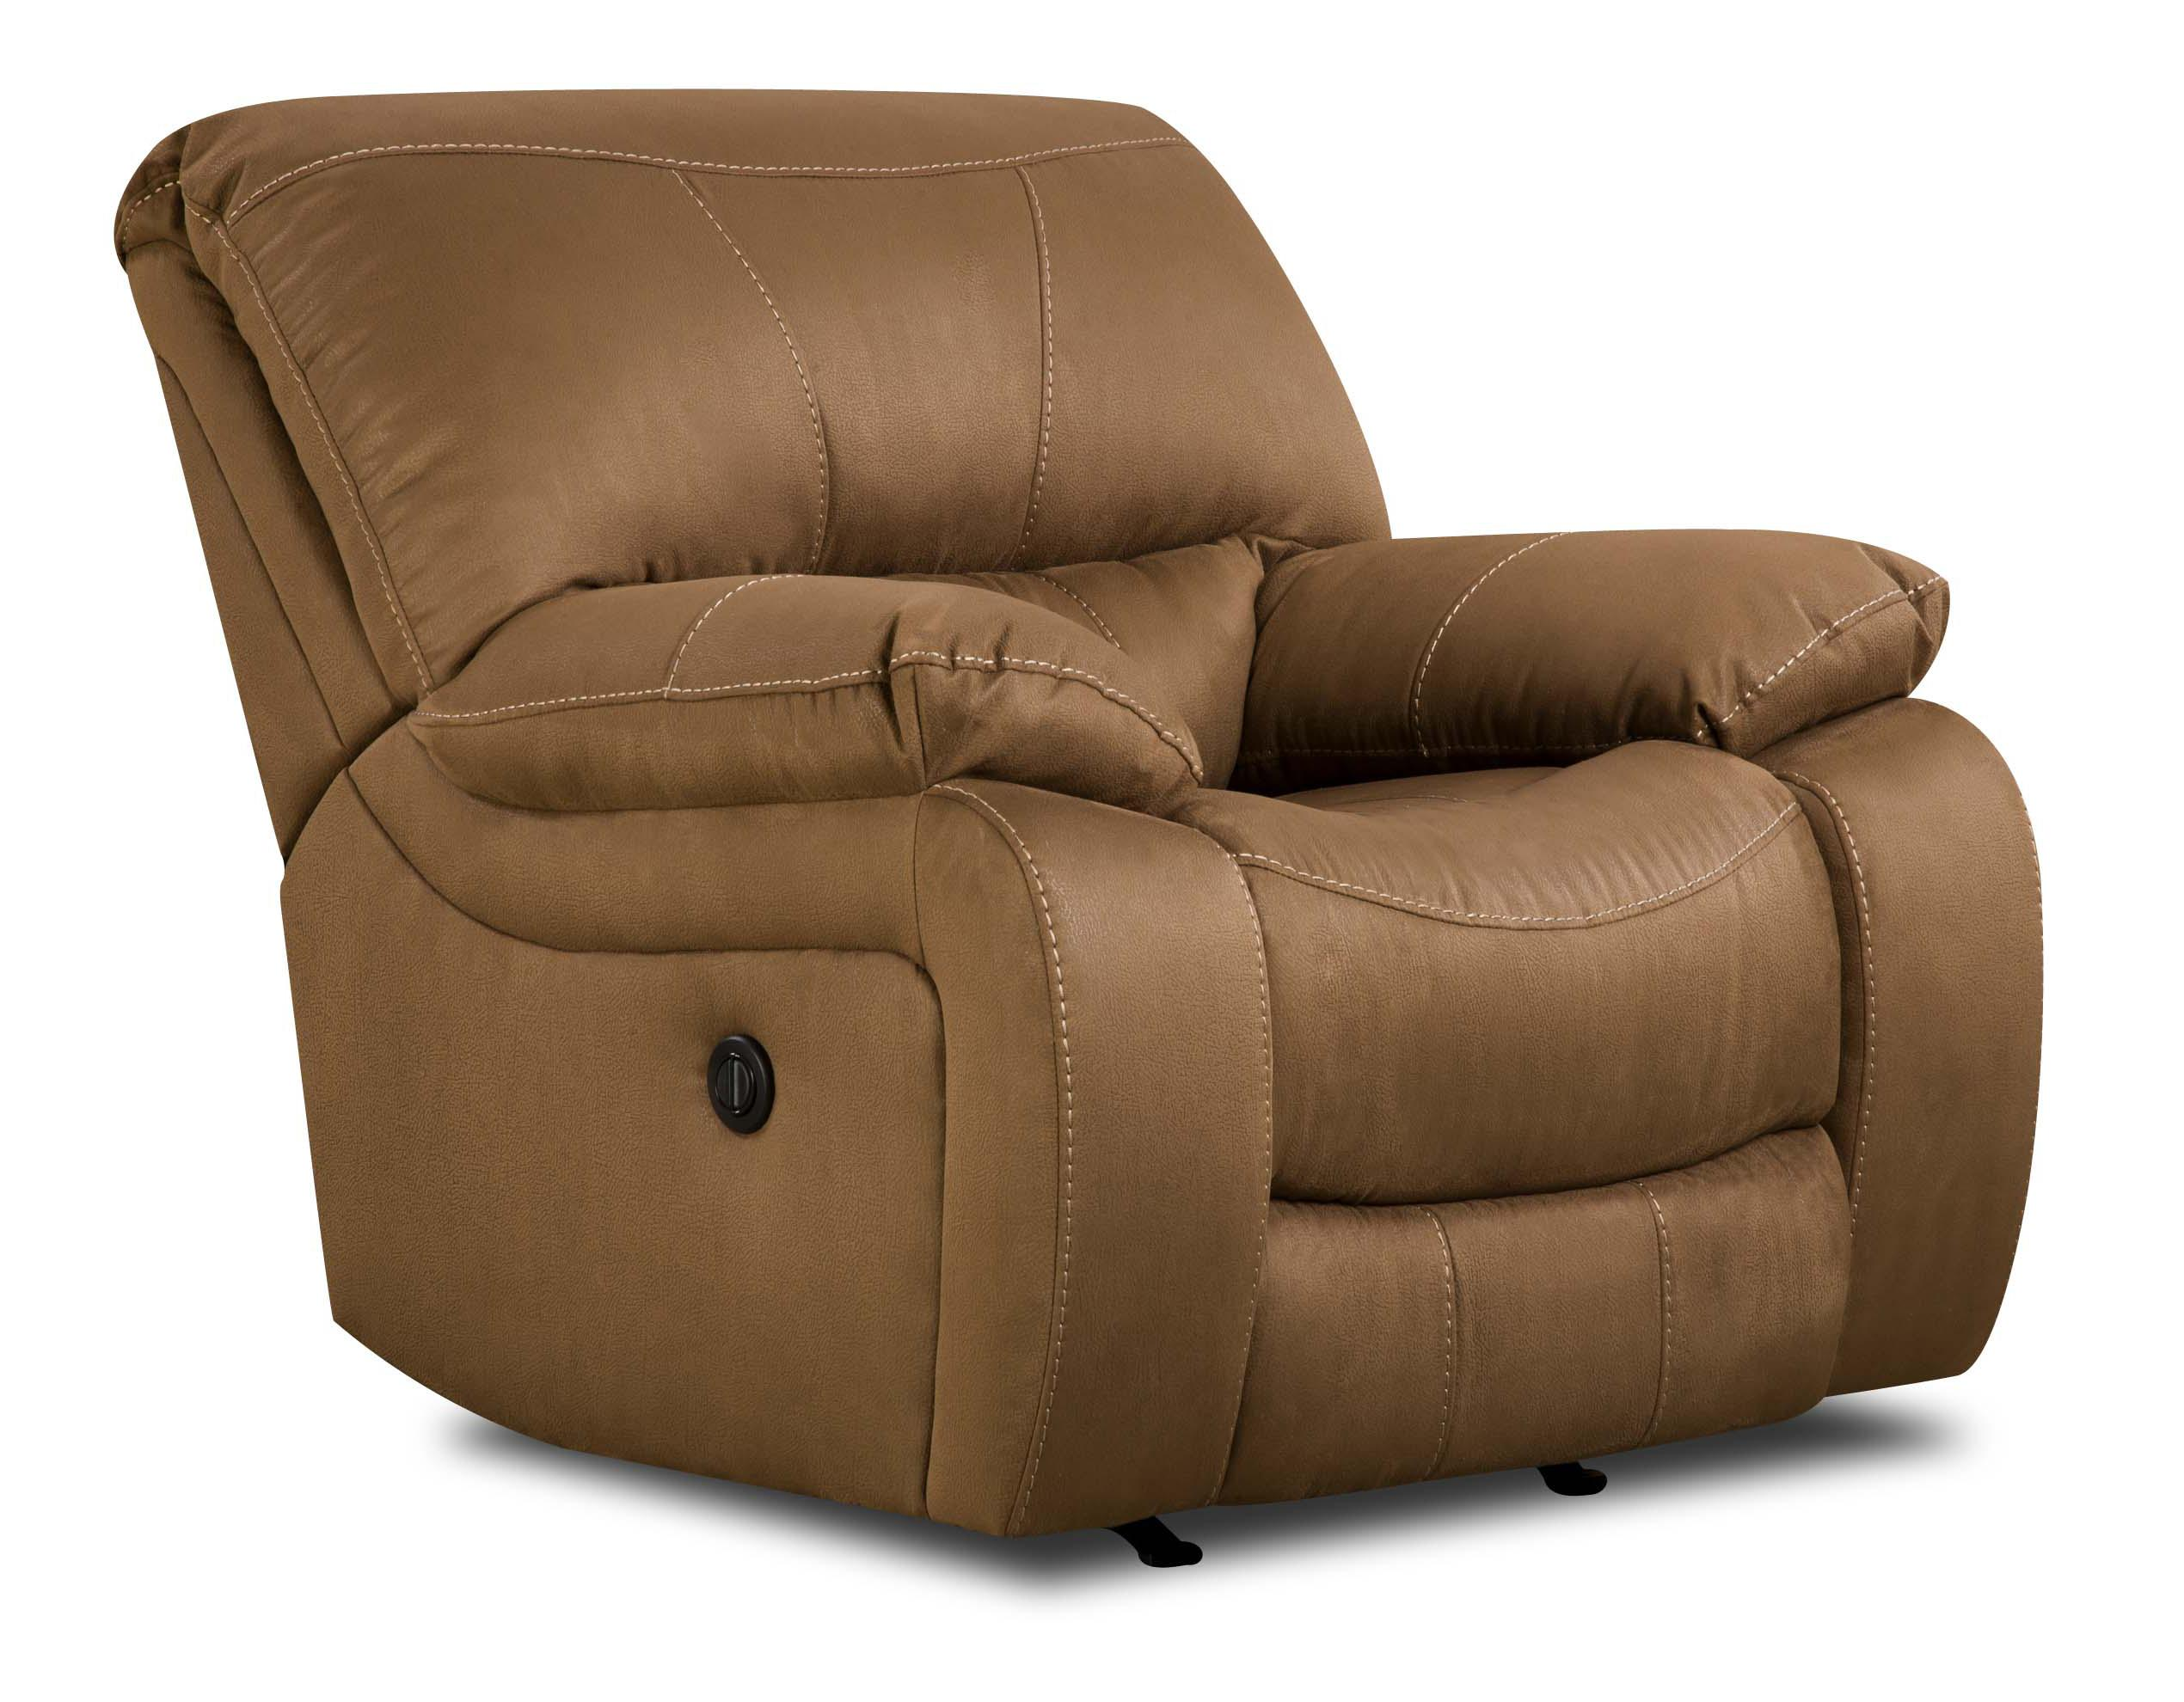 Simmons Upholstery 50240 Casual Rocker Recliner - Item Number: 50240 Rocker Sepia